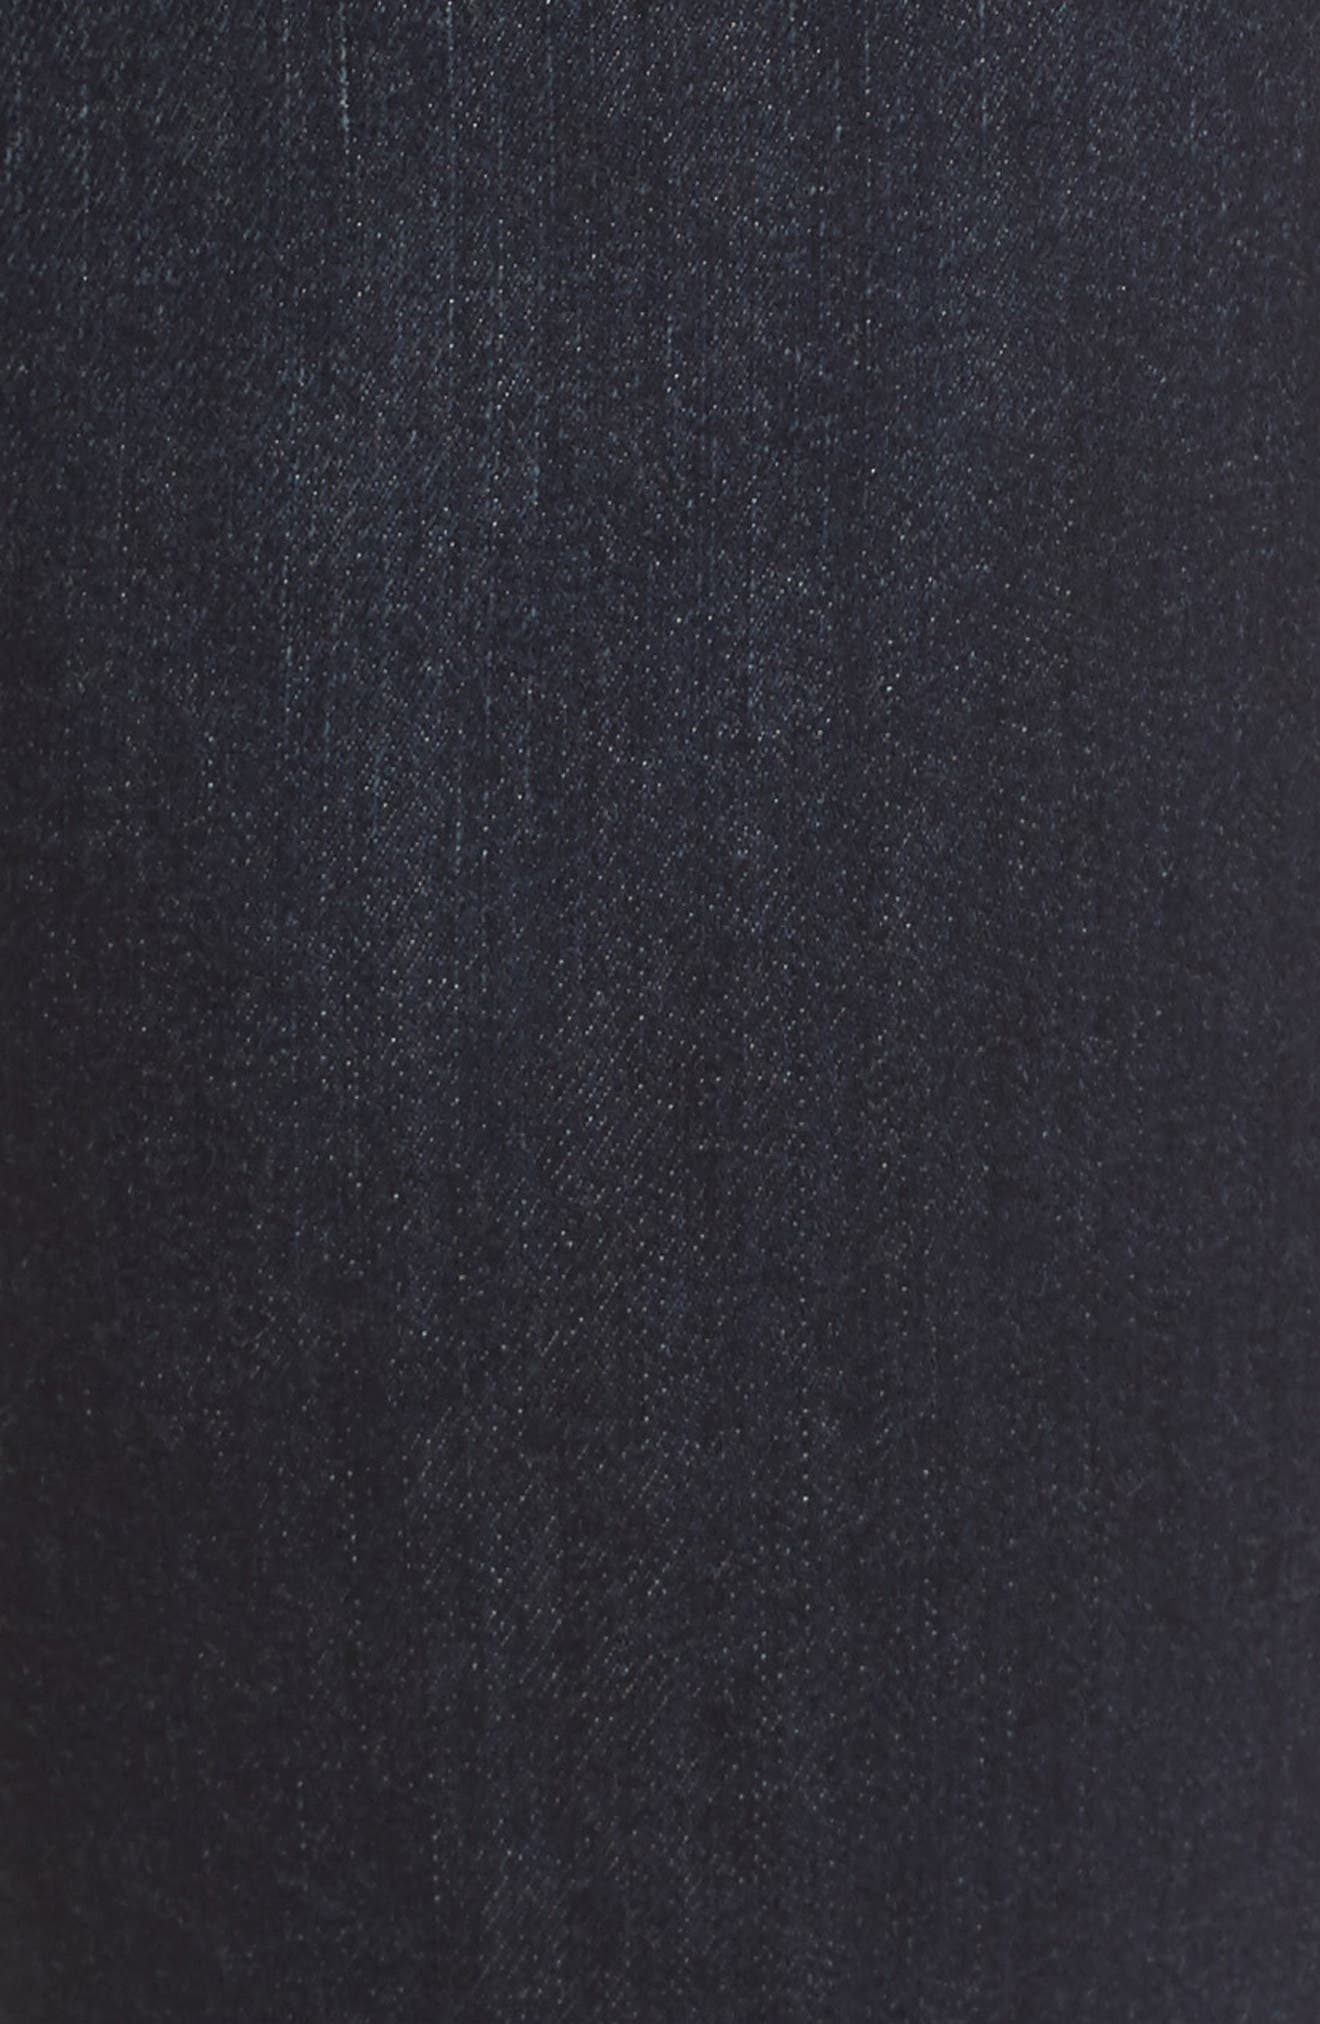 Diana Kurvy Stretch Ankle Jeans,                             Alternate thumbnail 5, color,                             490